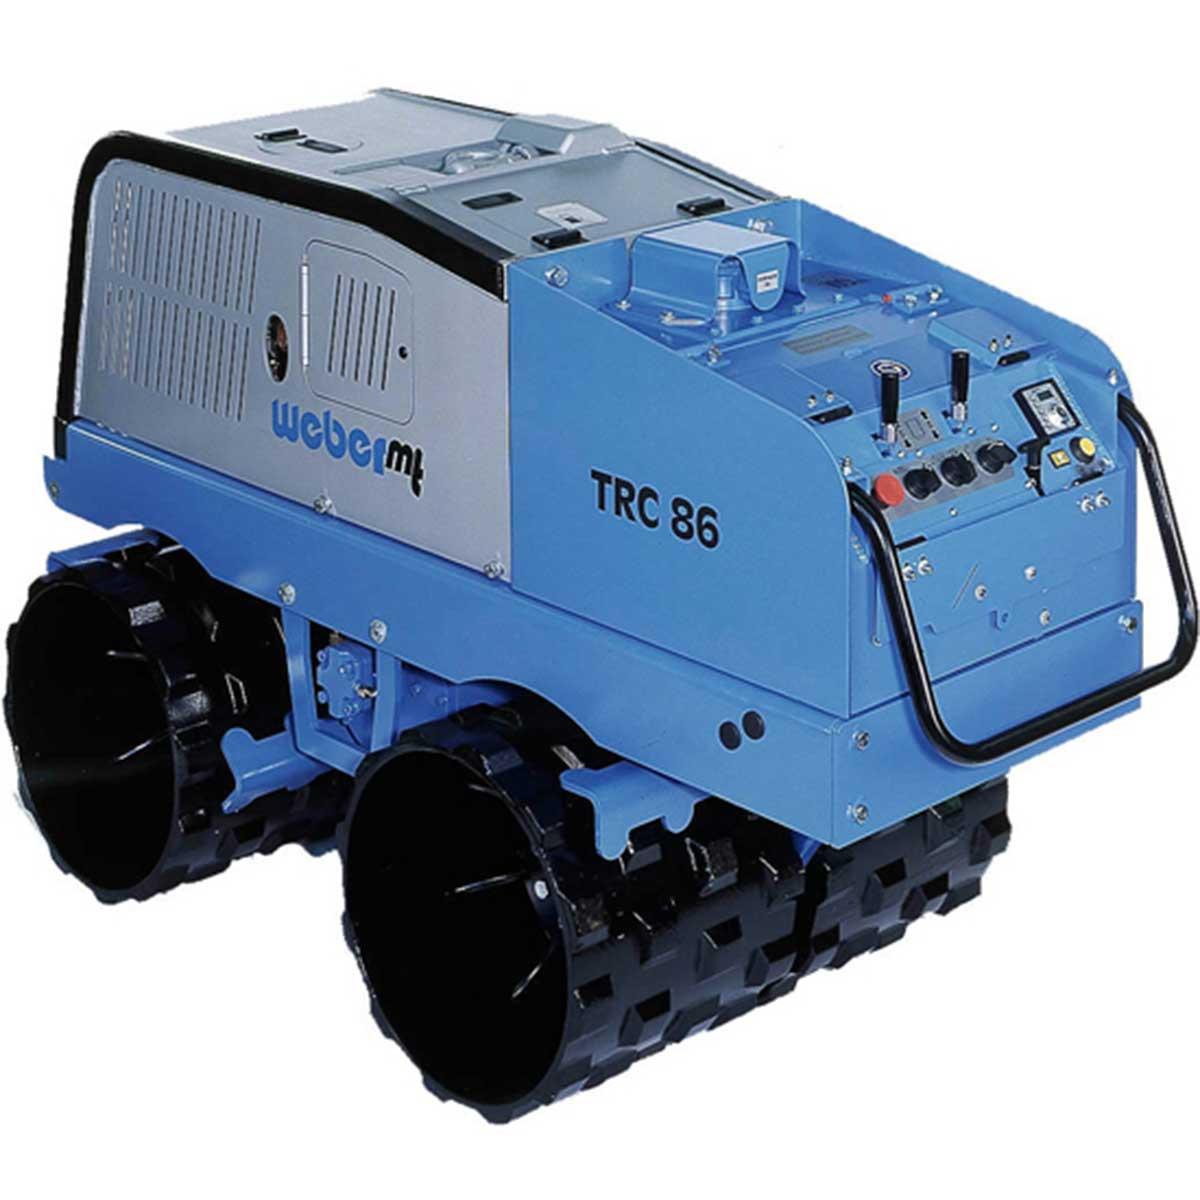 Weber mt TRC Trench Roller Diesel